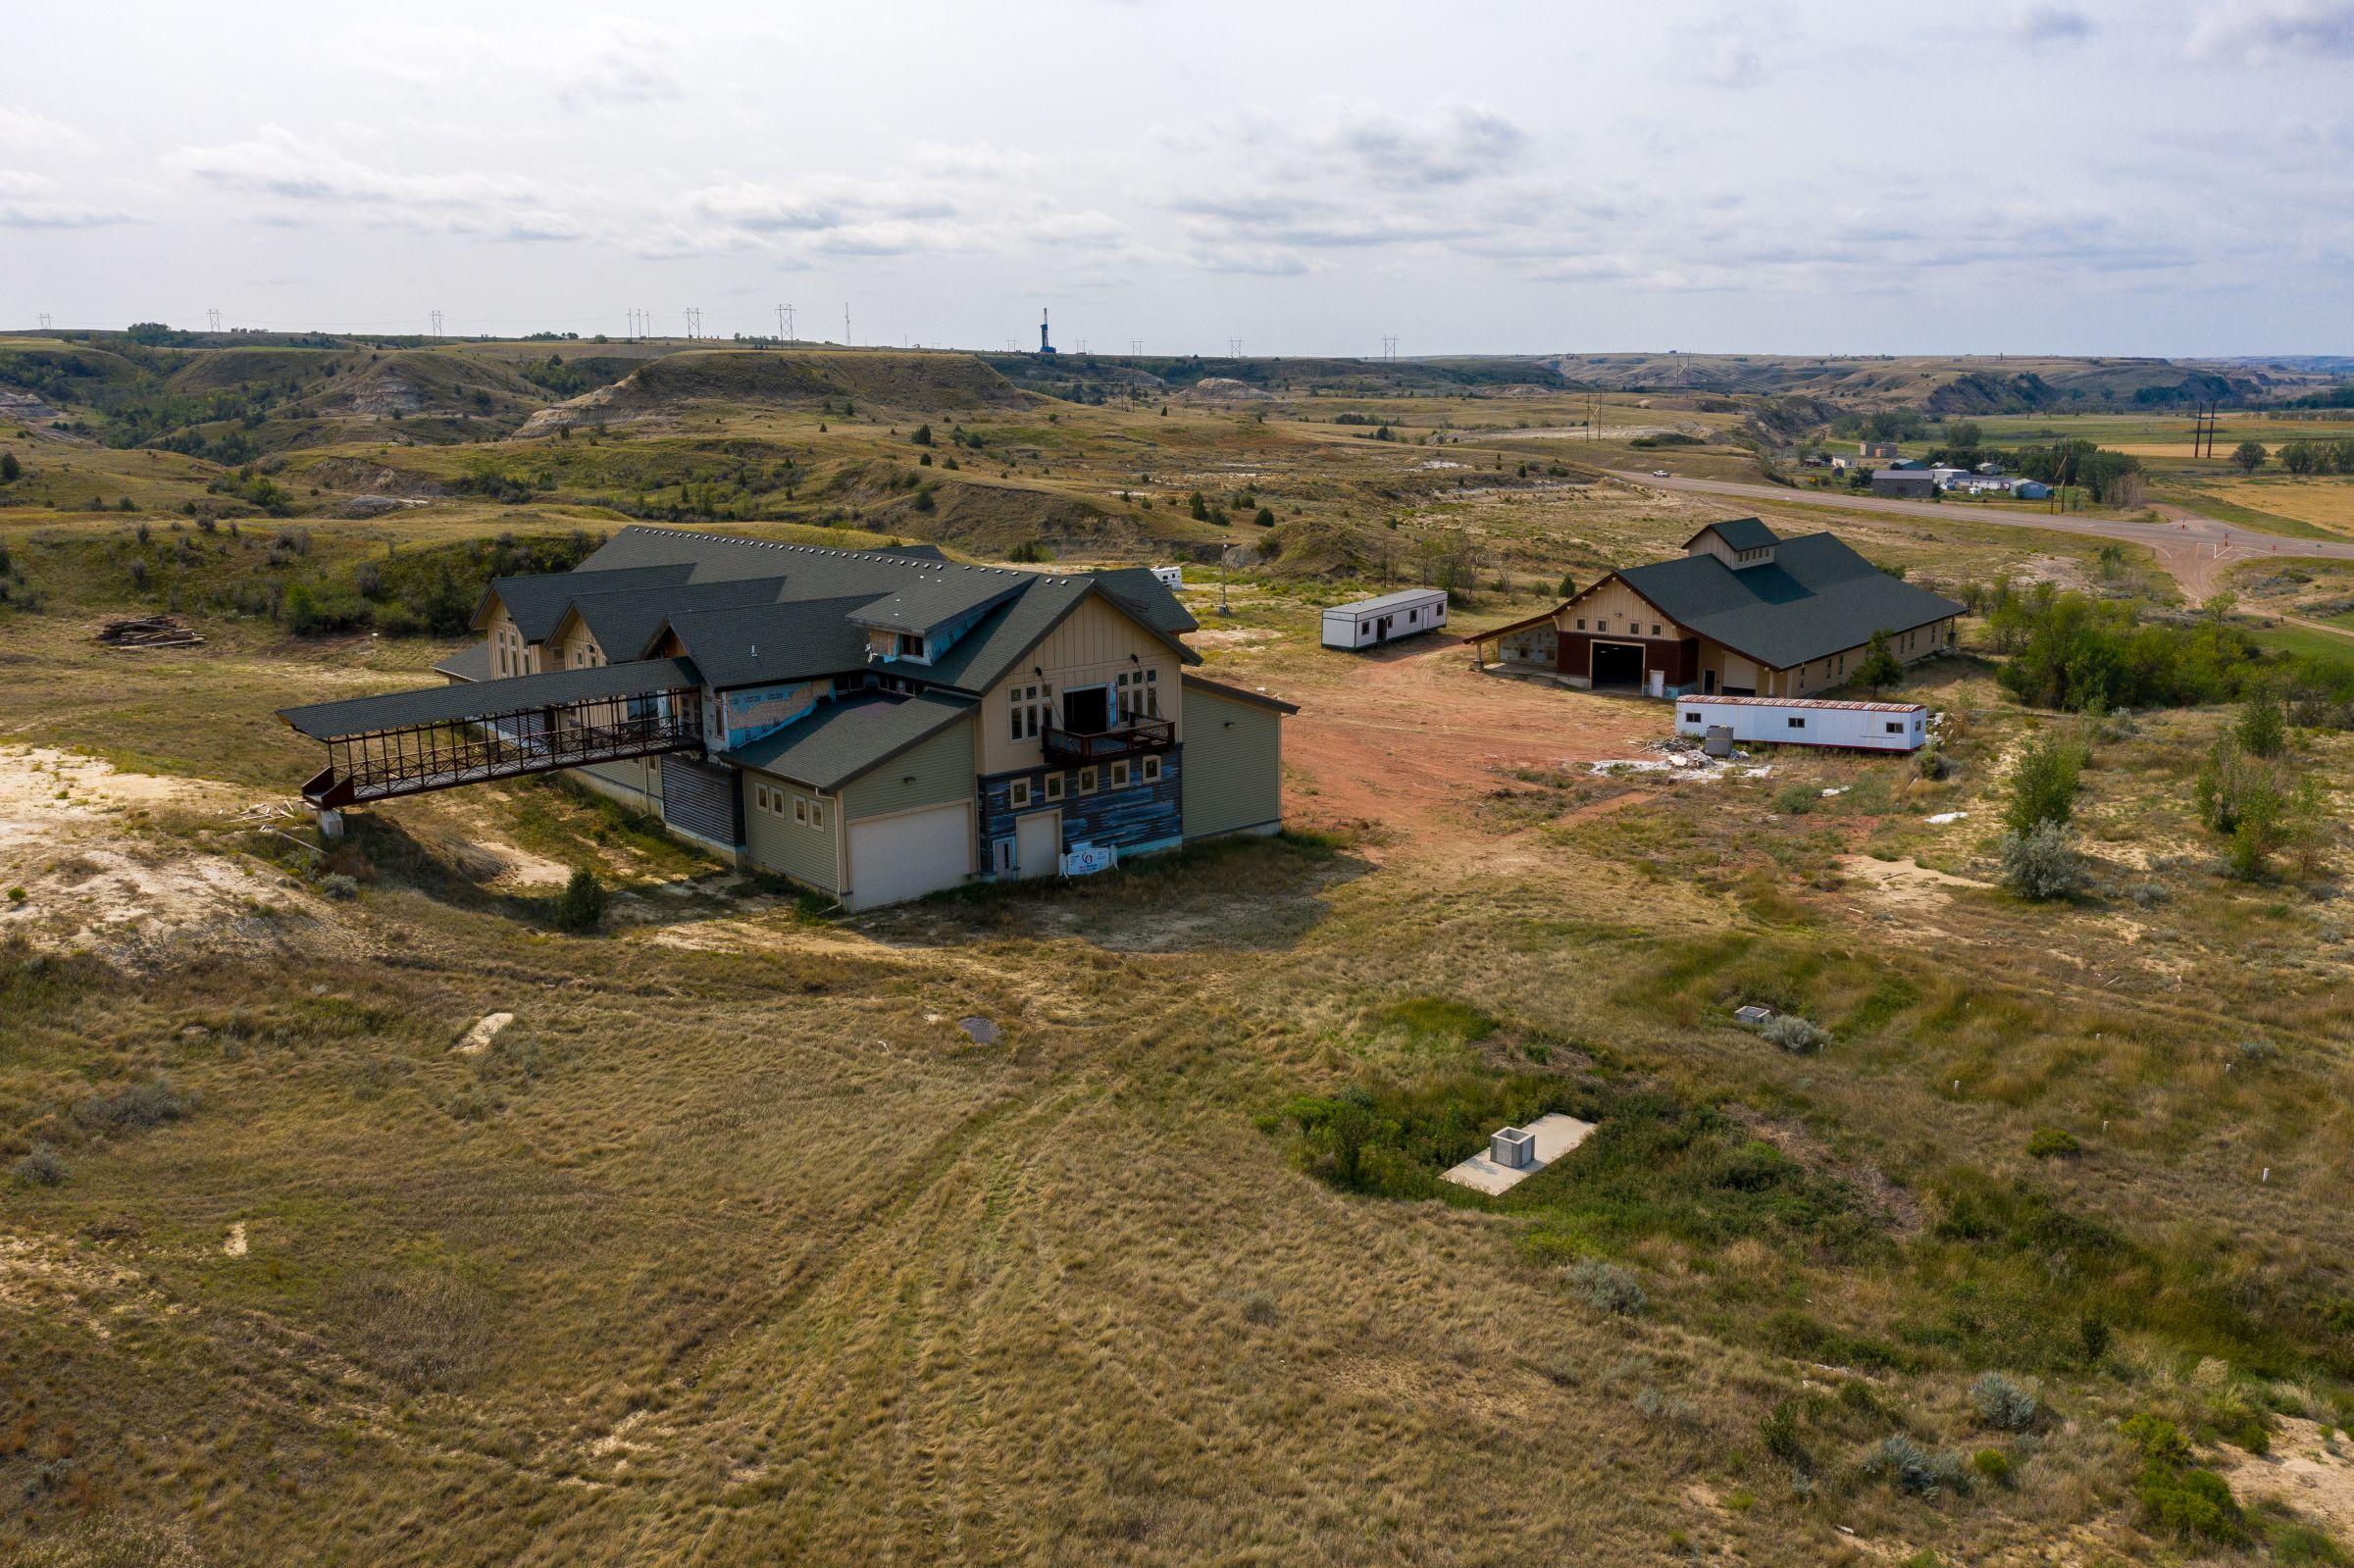 auctions-land-mckenzie-county-north-dakota-270-acres-listing-number-15735-2-2021-09-10-043902.jpeg